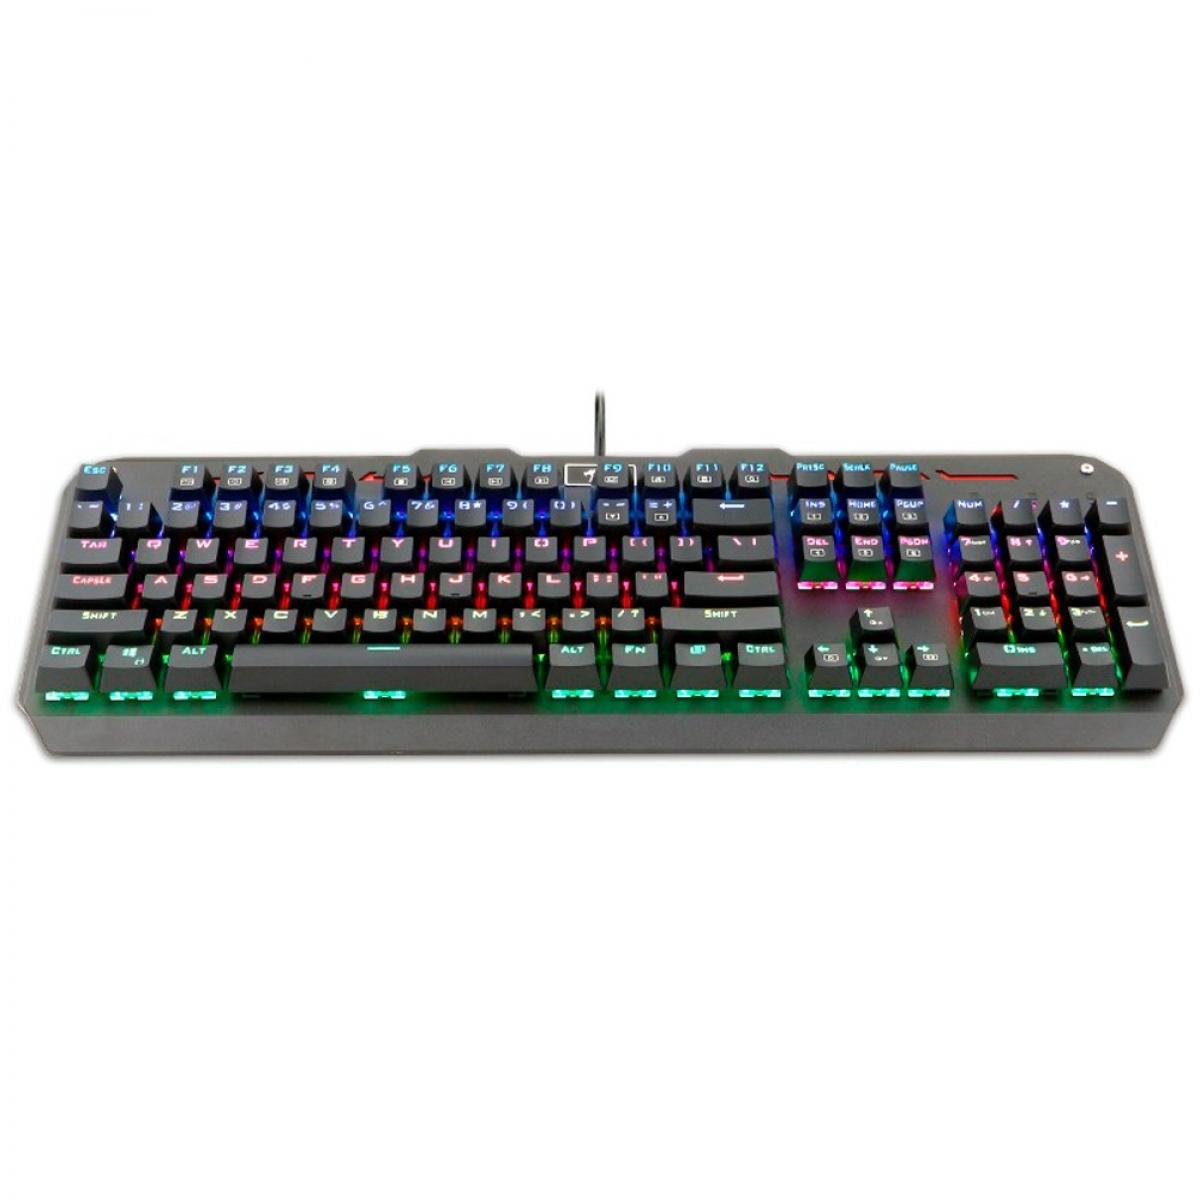 Teclado Mecânico Gamer Redragon Varuna K559 RGB, Switch Blue, ABNT2, Black